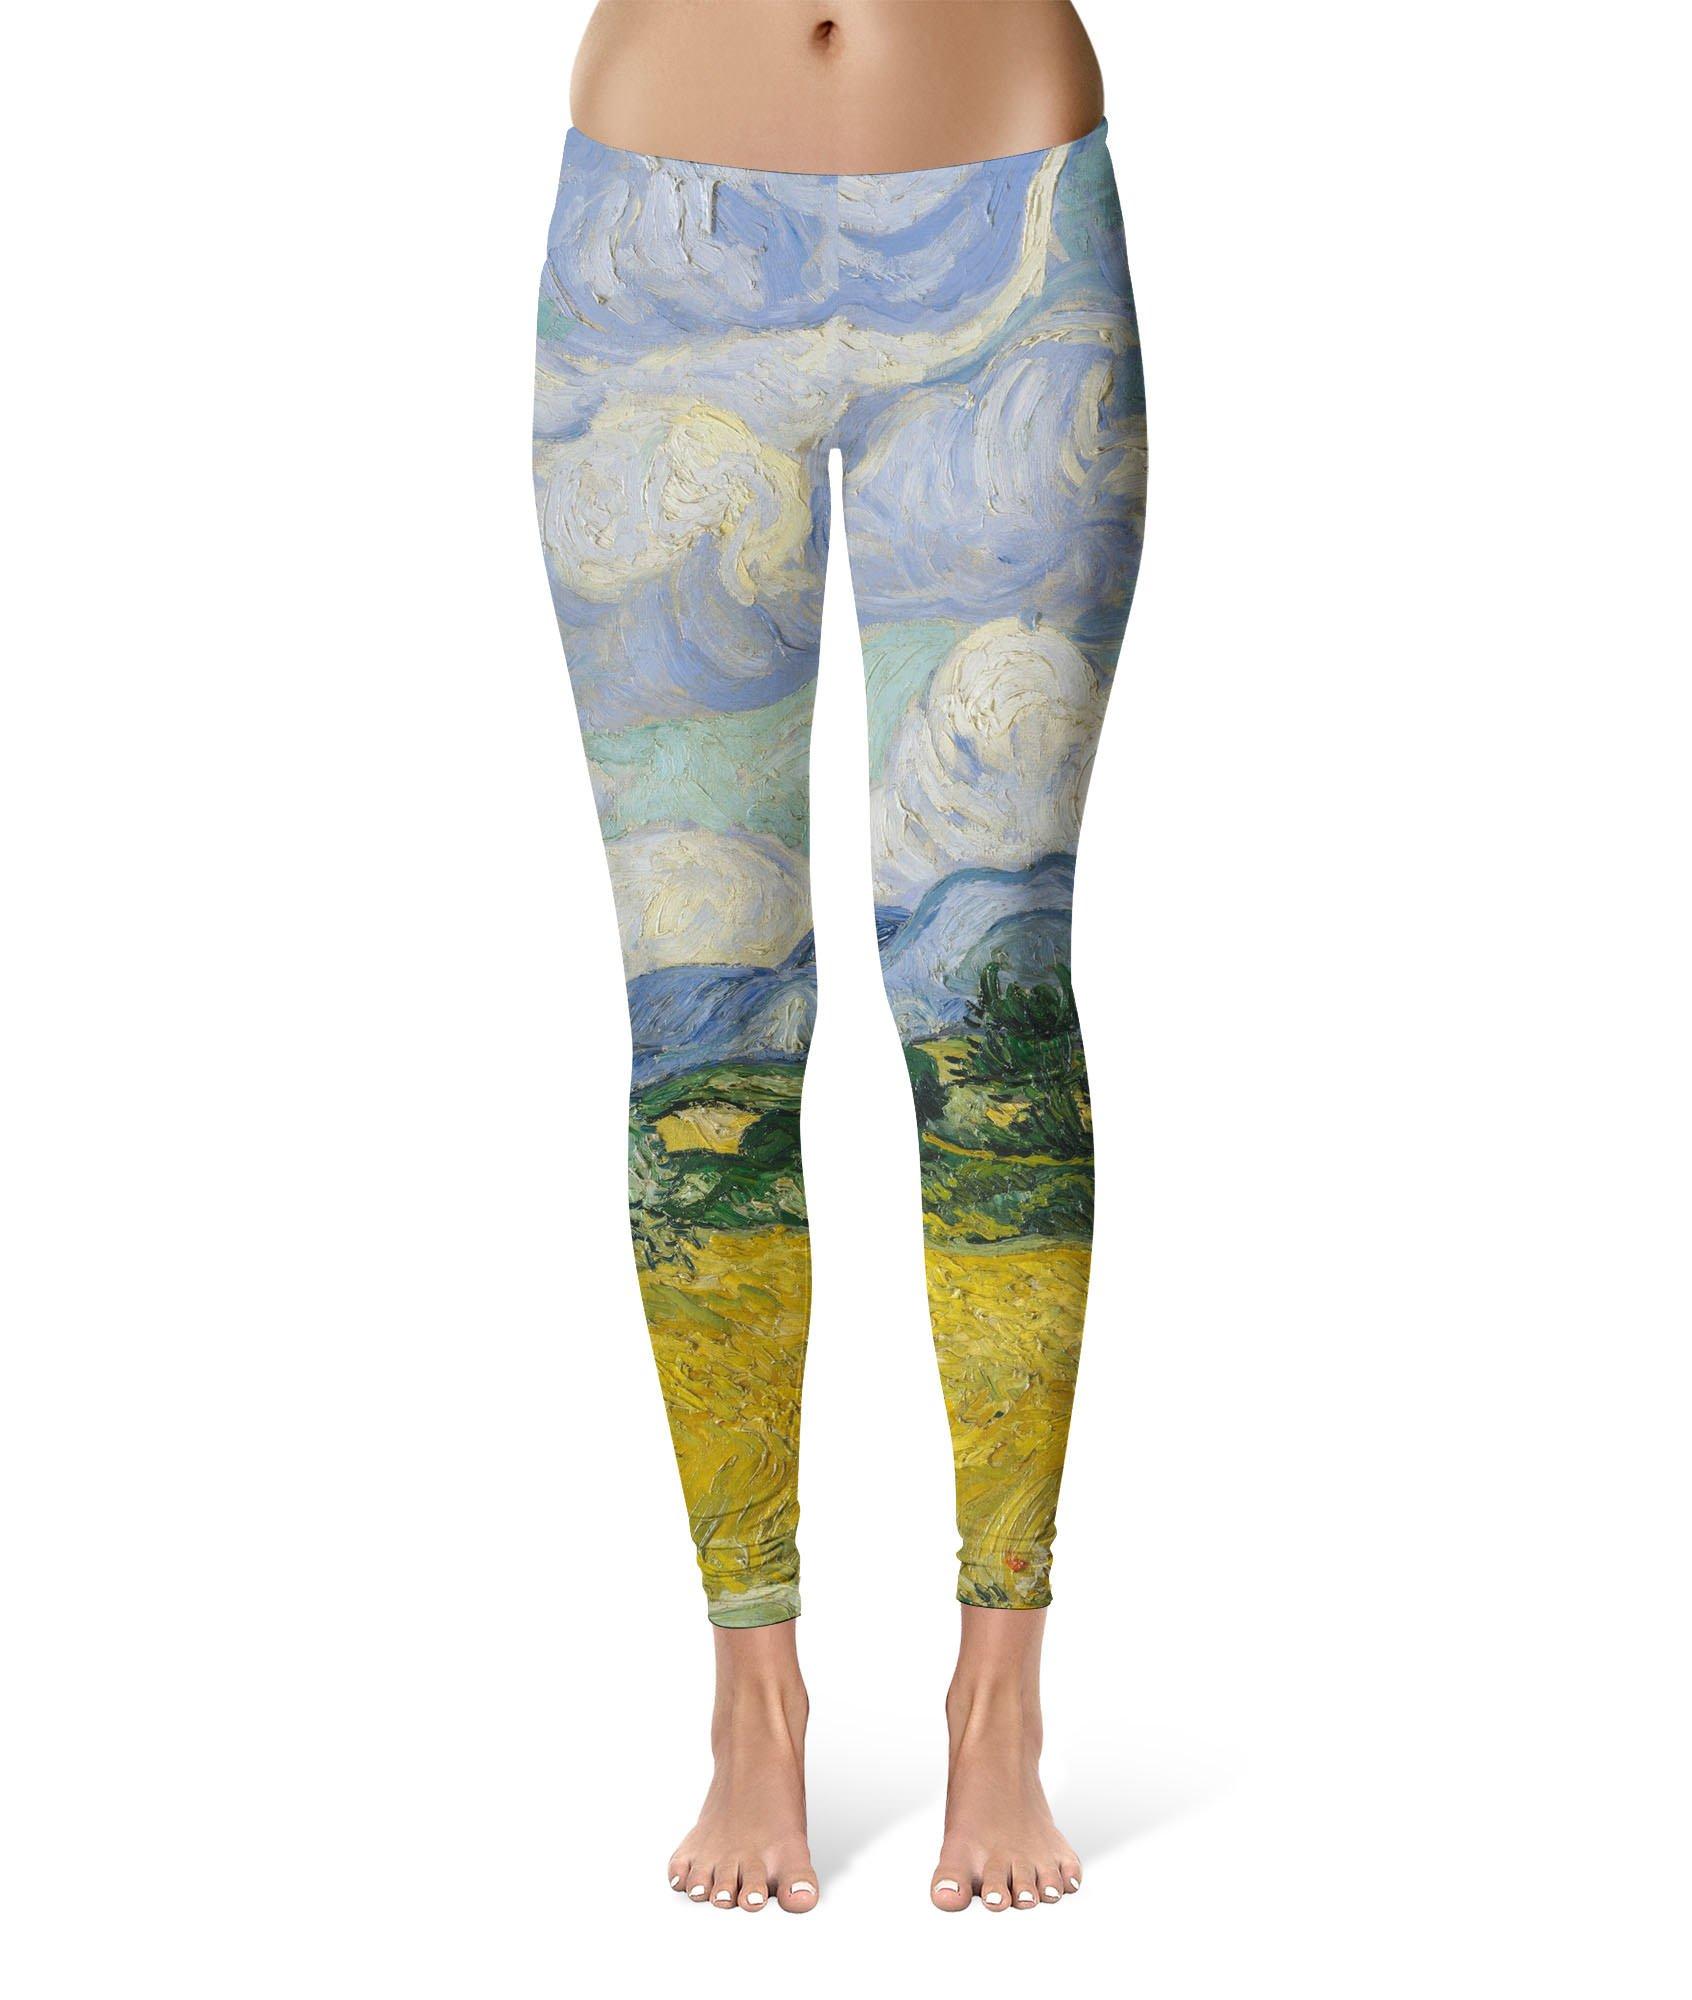 Vincent Van Gogh Fine Art Painting Sport Leggings - Full Length, Mid/High Waist